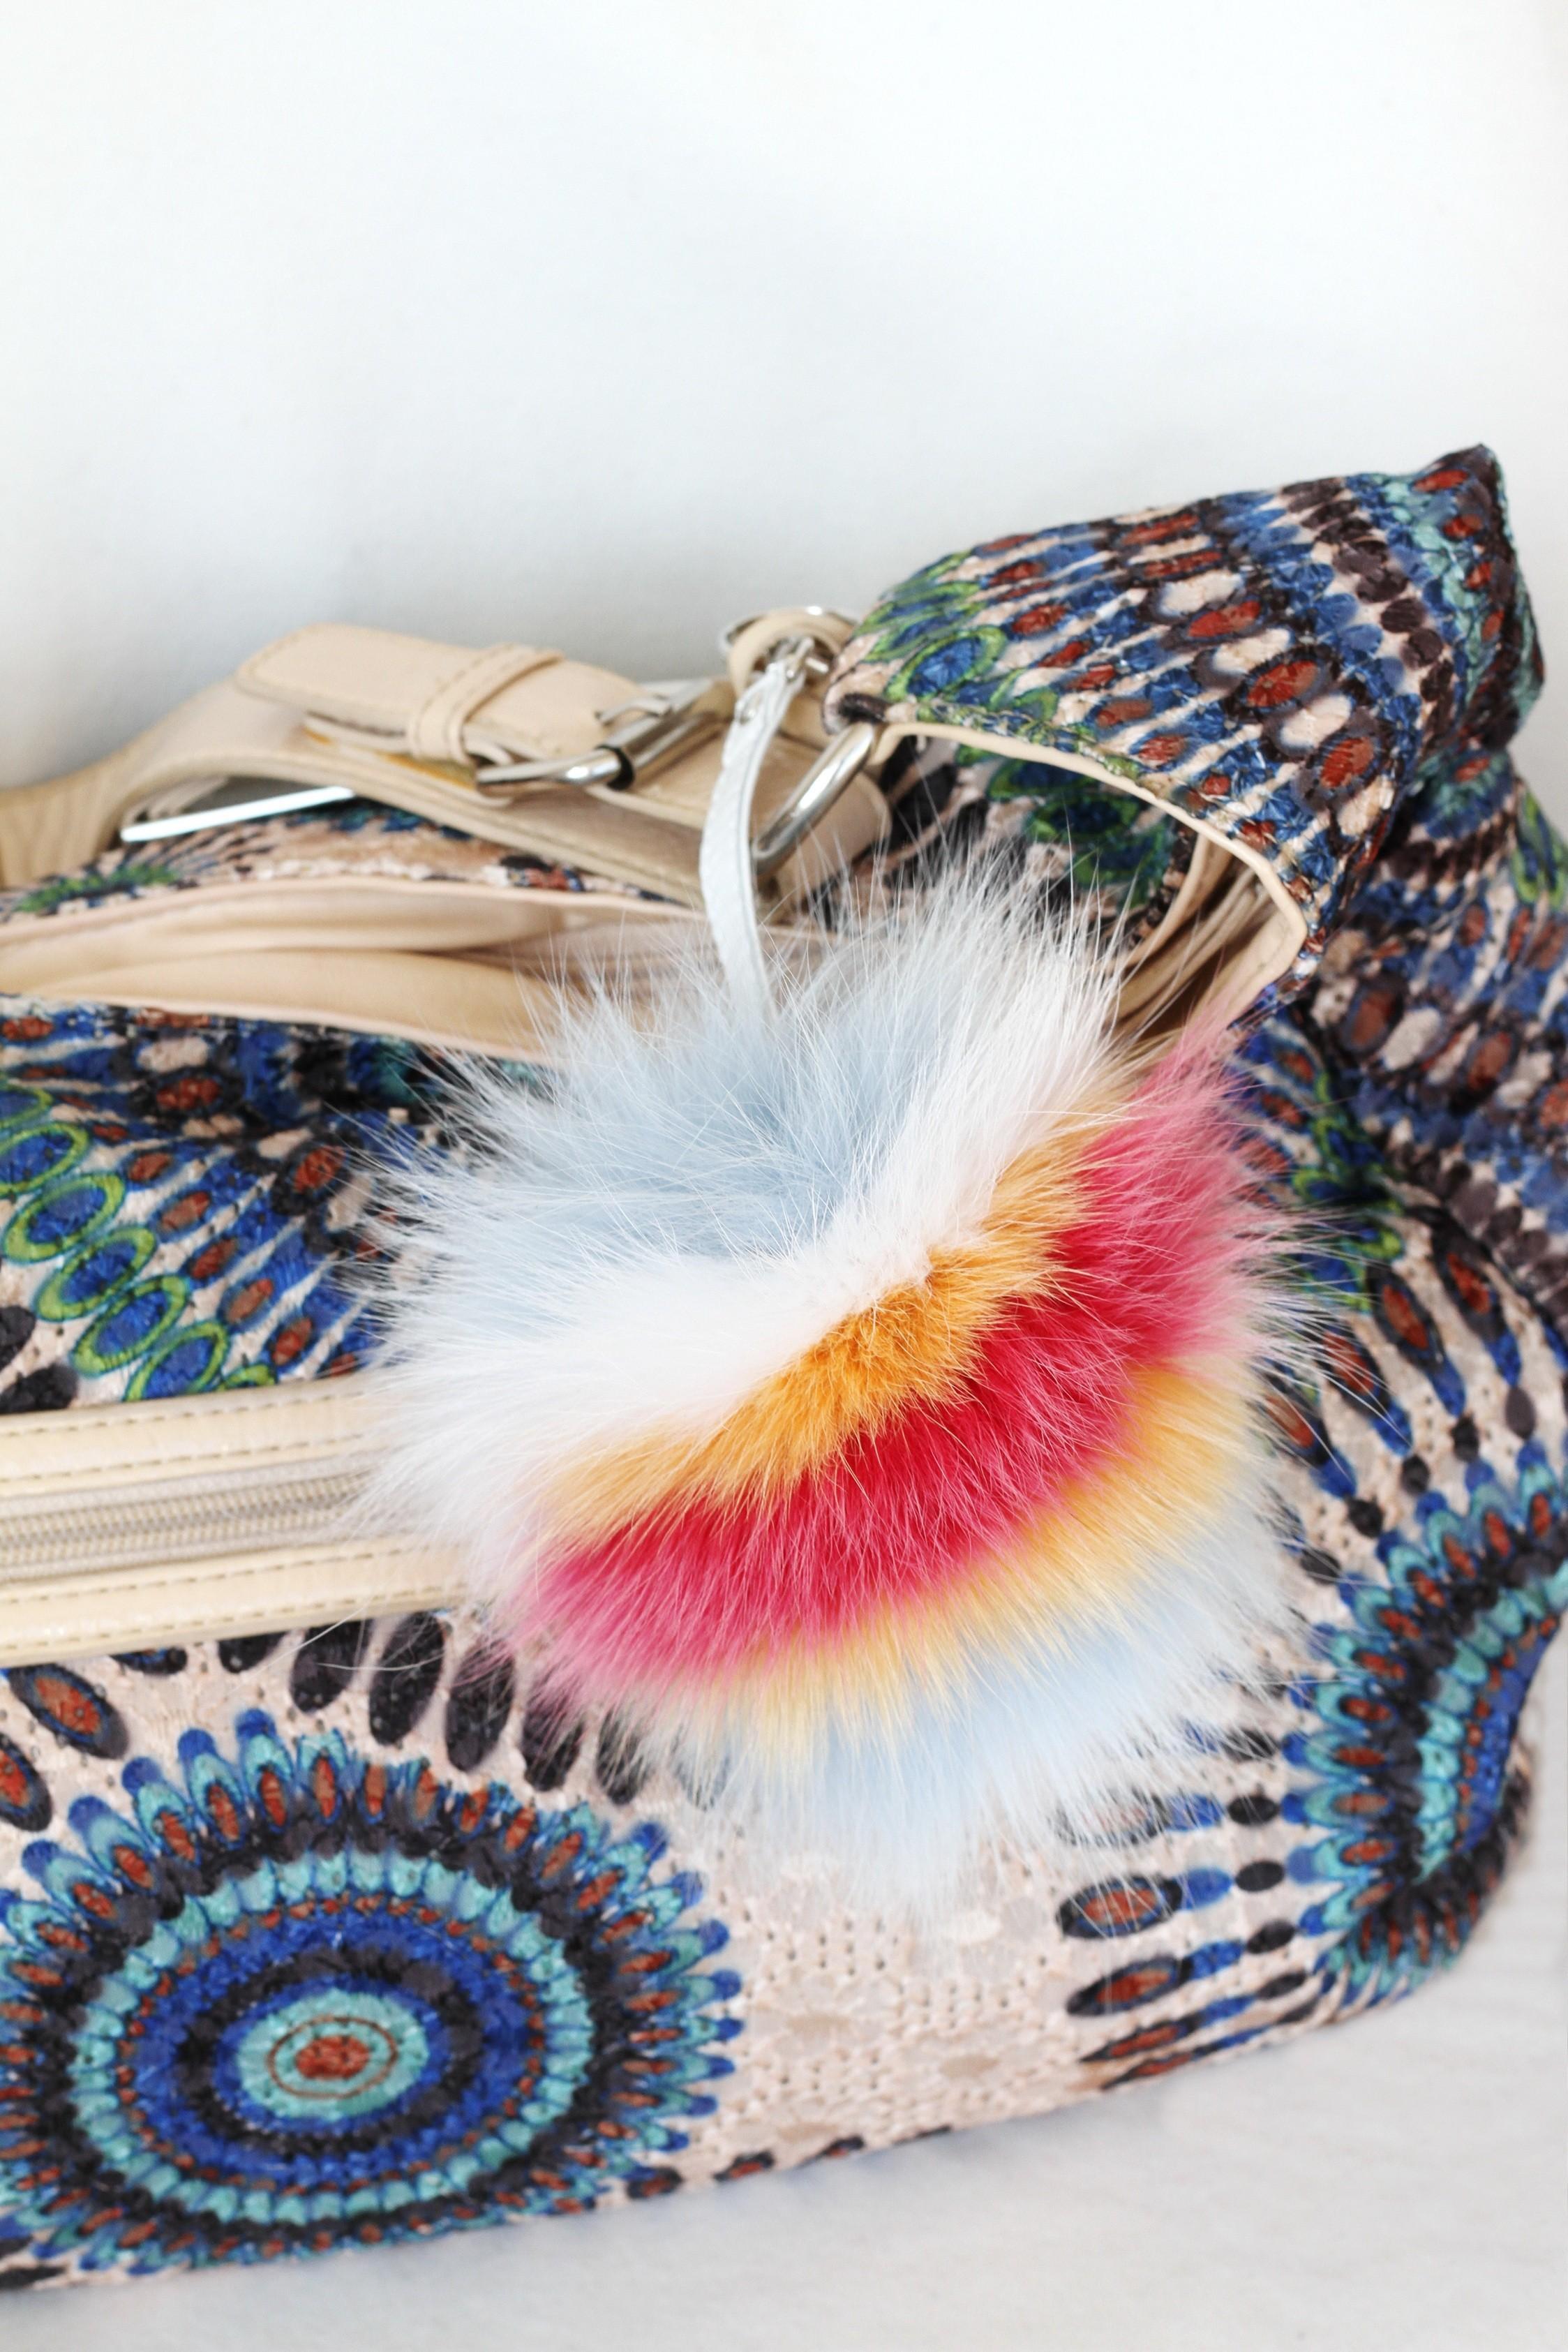 Buy Pom Pom Real Fur Bag Charm Pendant Beige White Black